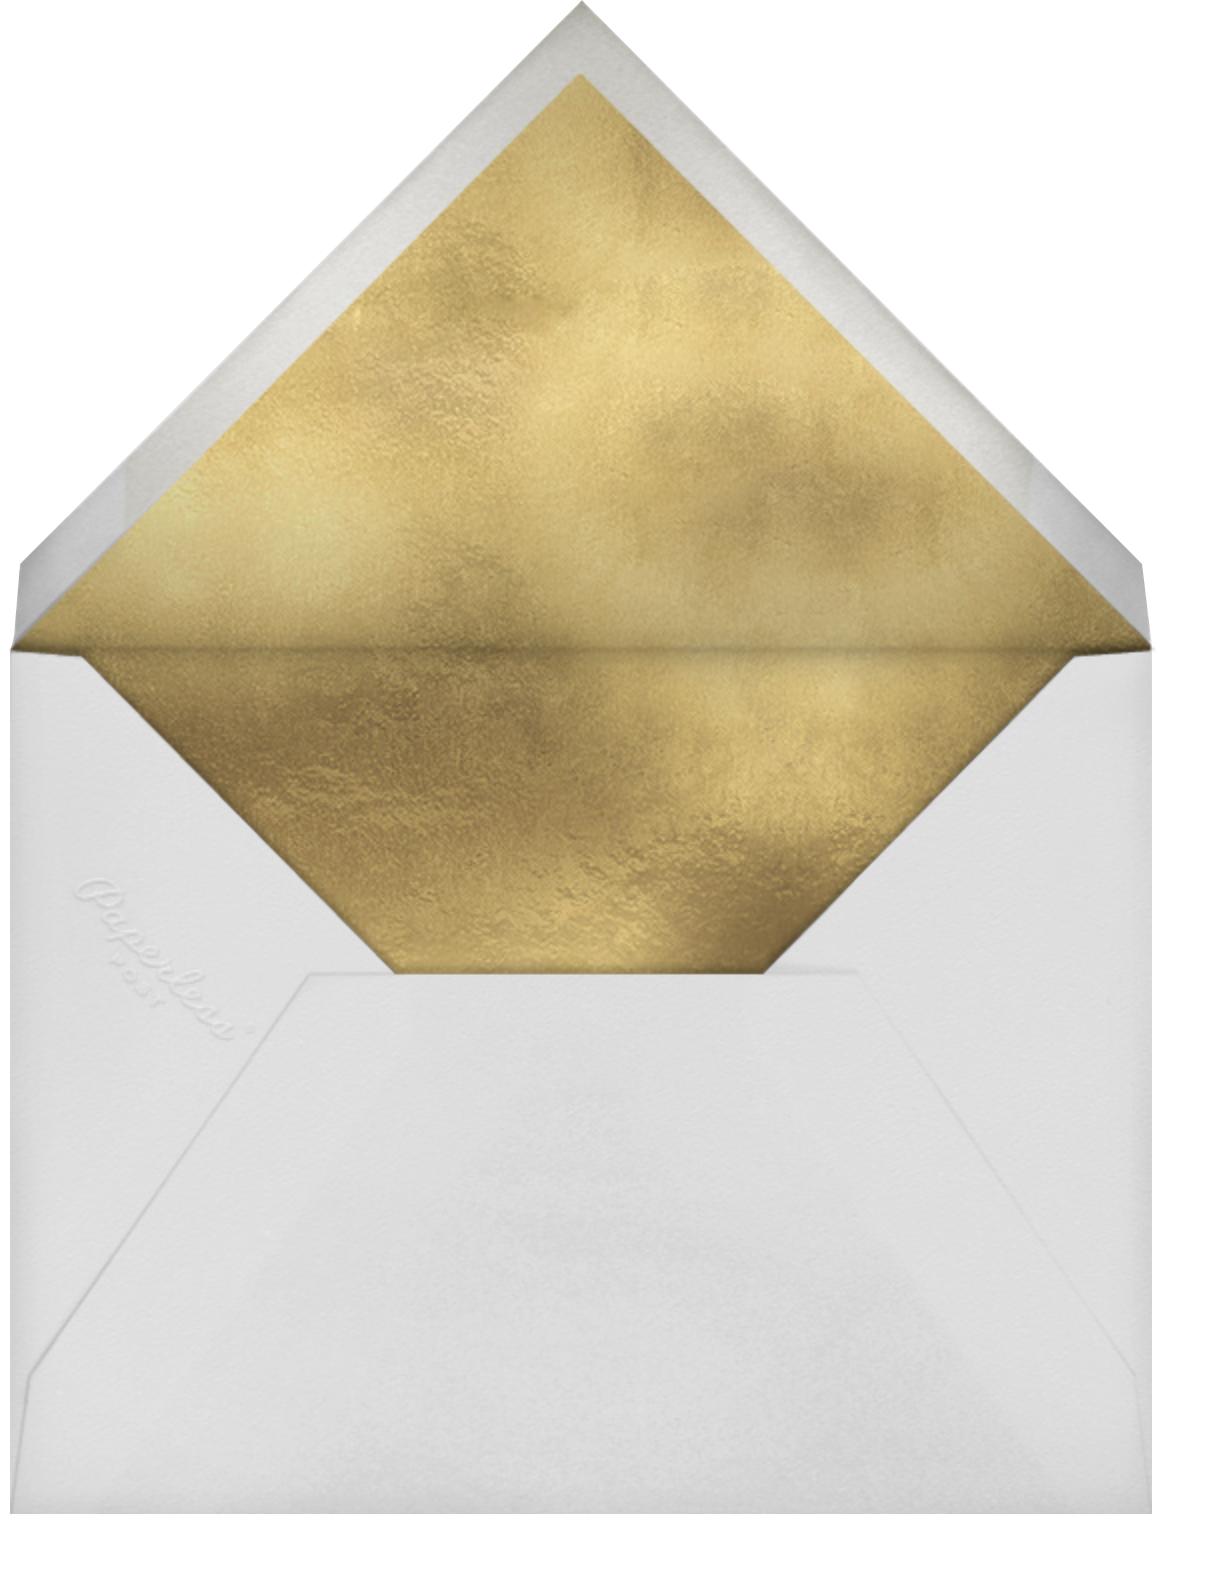 Painted Blooms - Crimson - Oscar de la Renta - Valentine's Day - envelope back